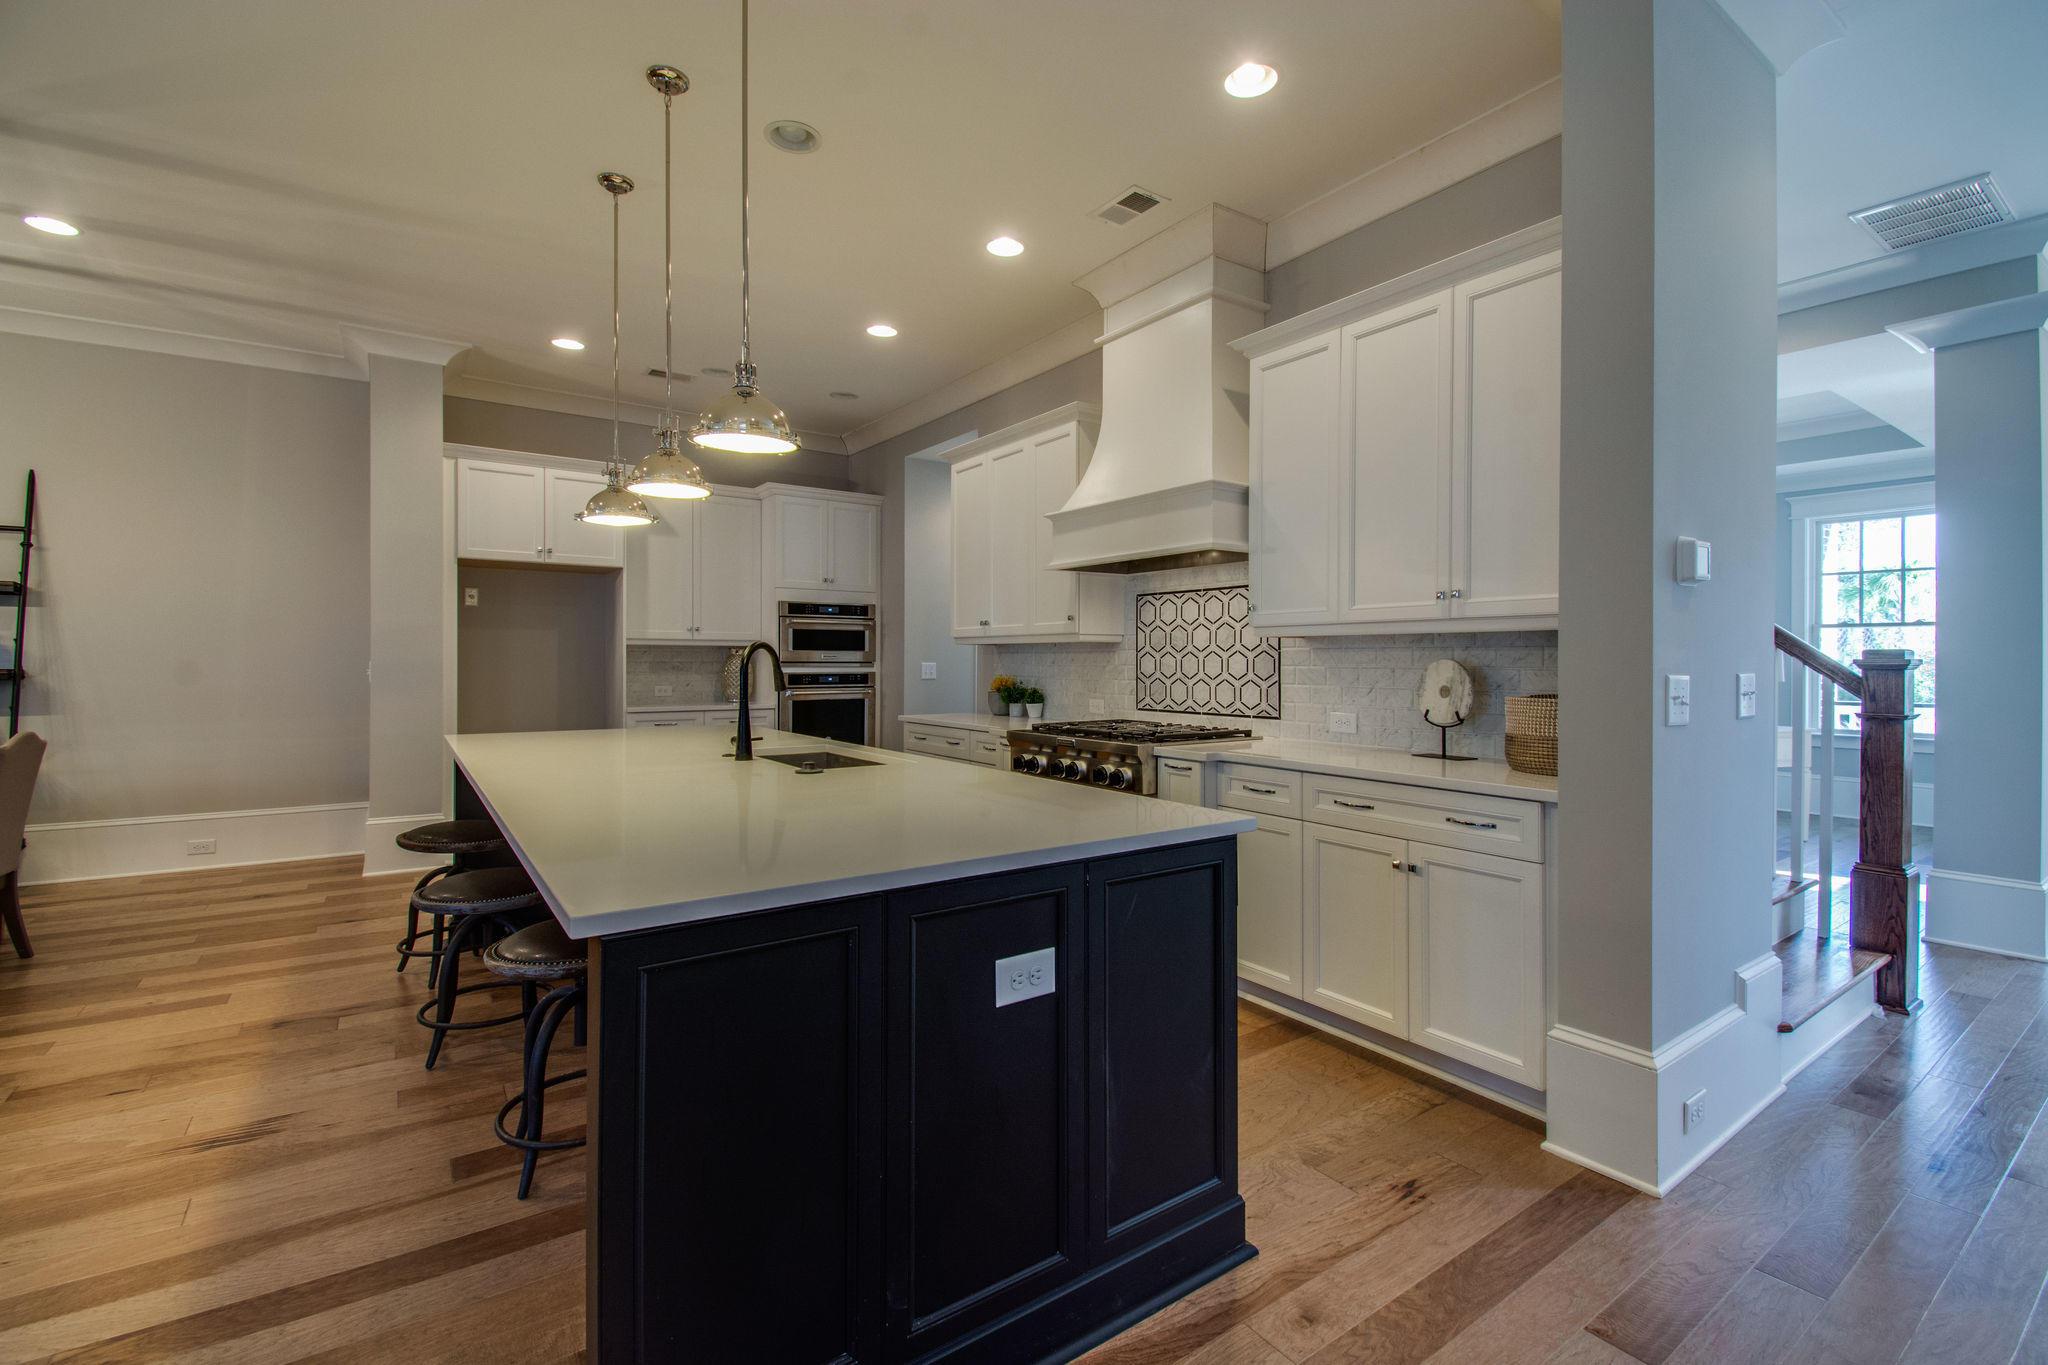 Daniel Island Park Homes For Sale - 112 Brailsford, Charleston, SC - 32